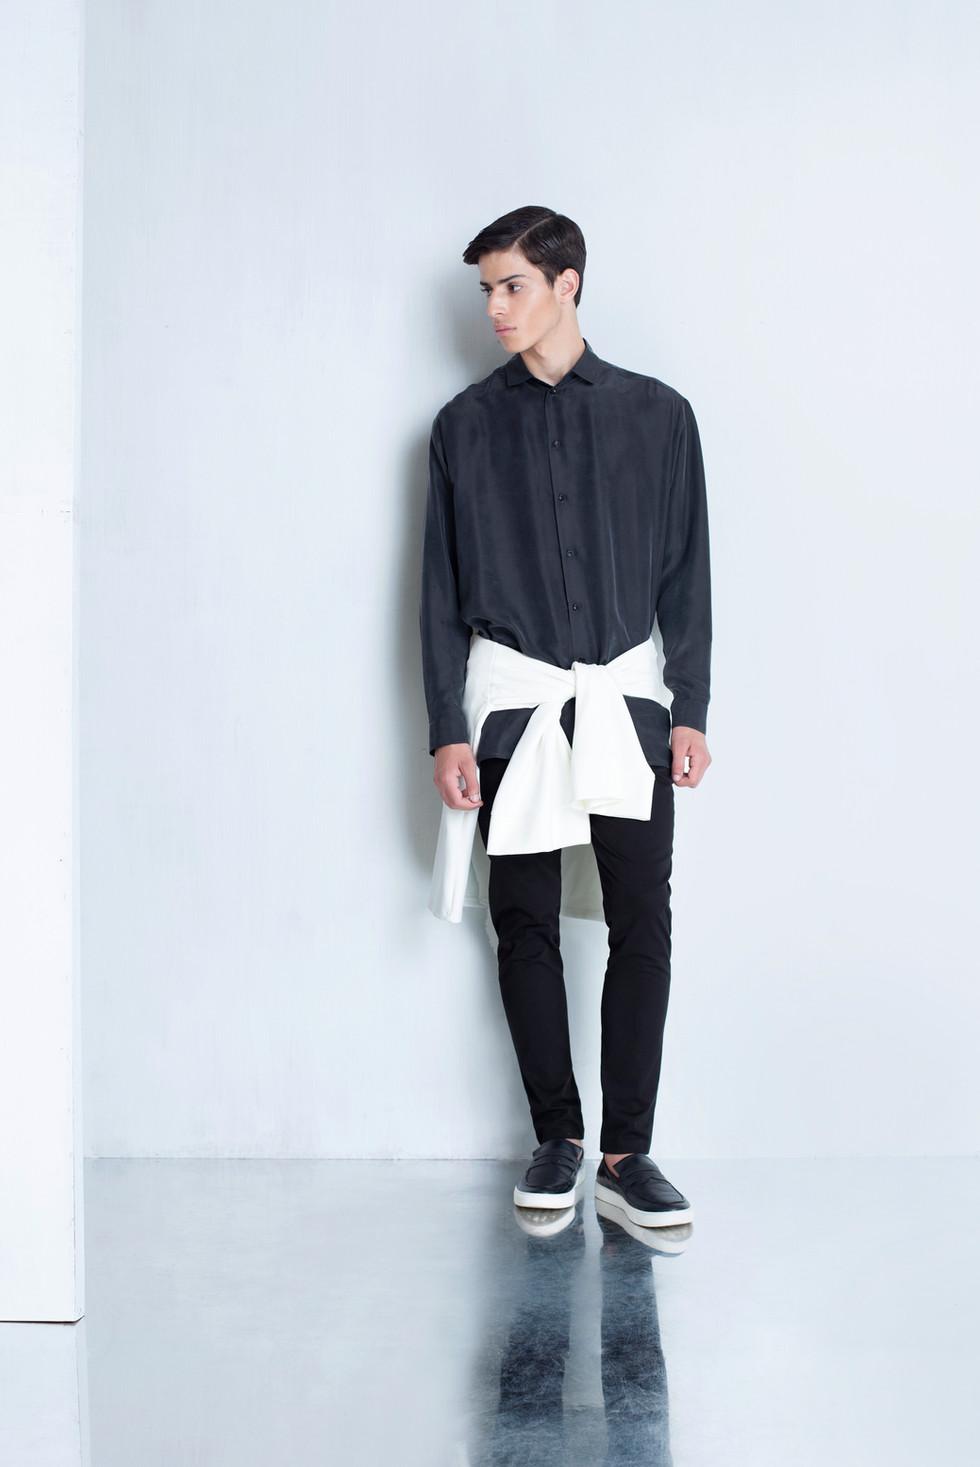 Ariel_Bassan_Minimal_Menswear_AW_LookBook_Oversized_Silk_Shirt